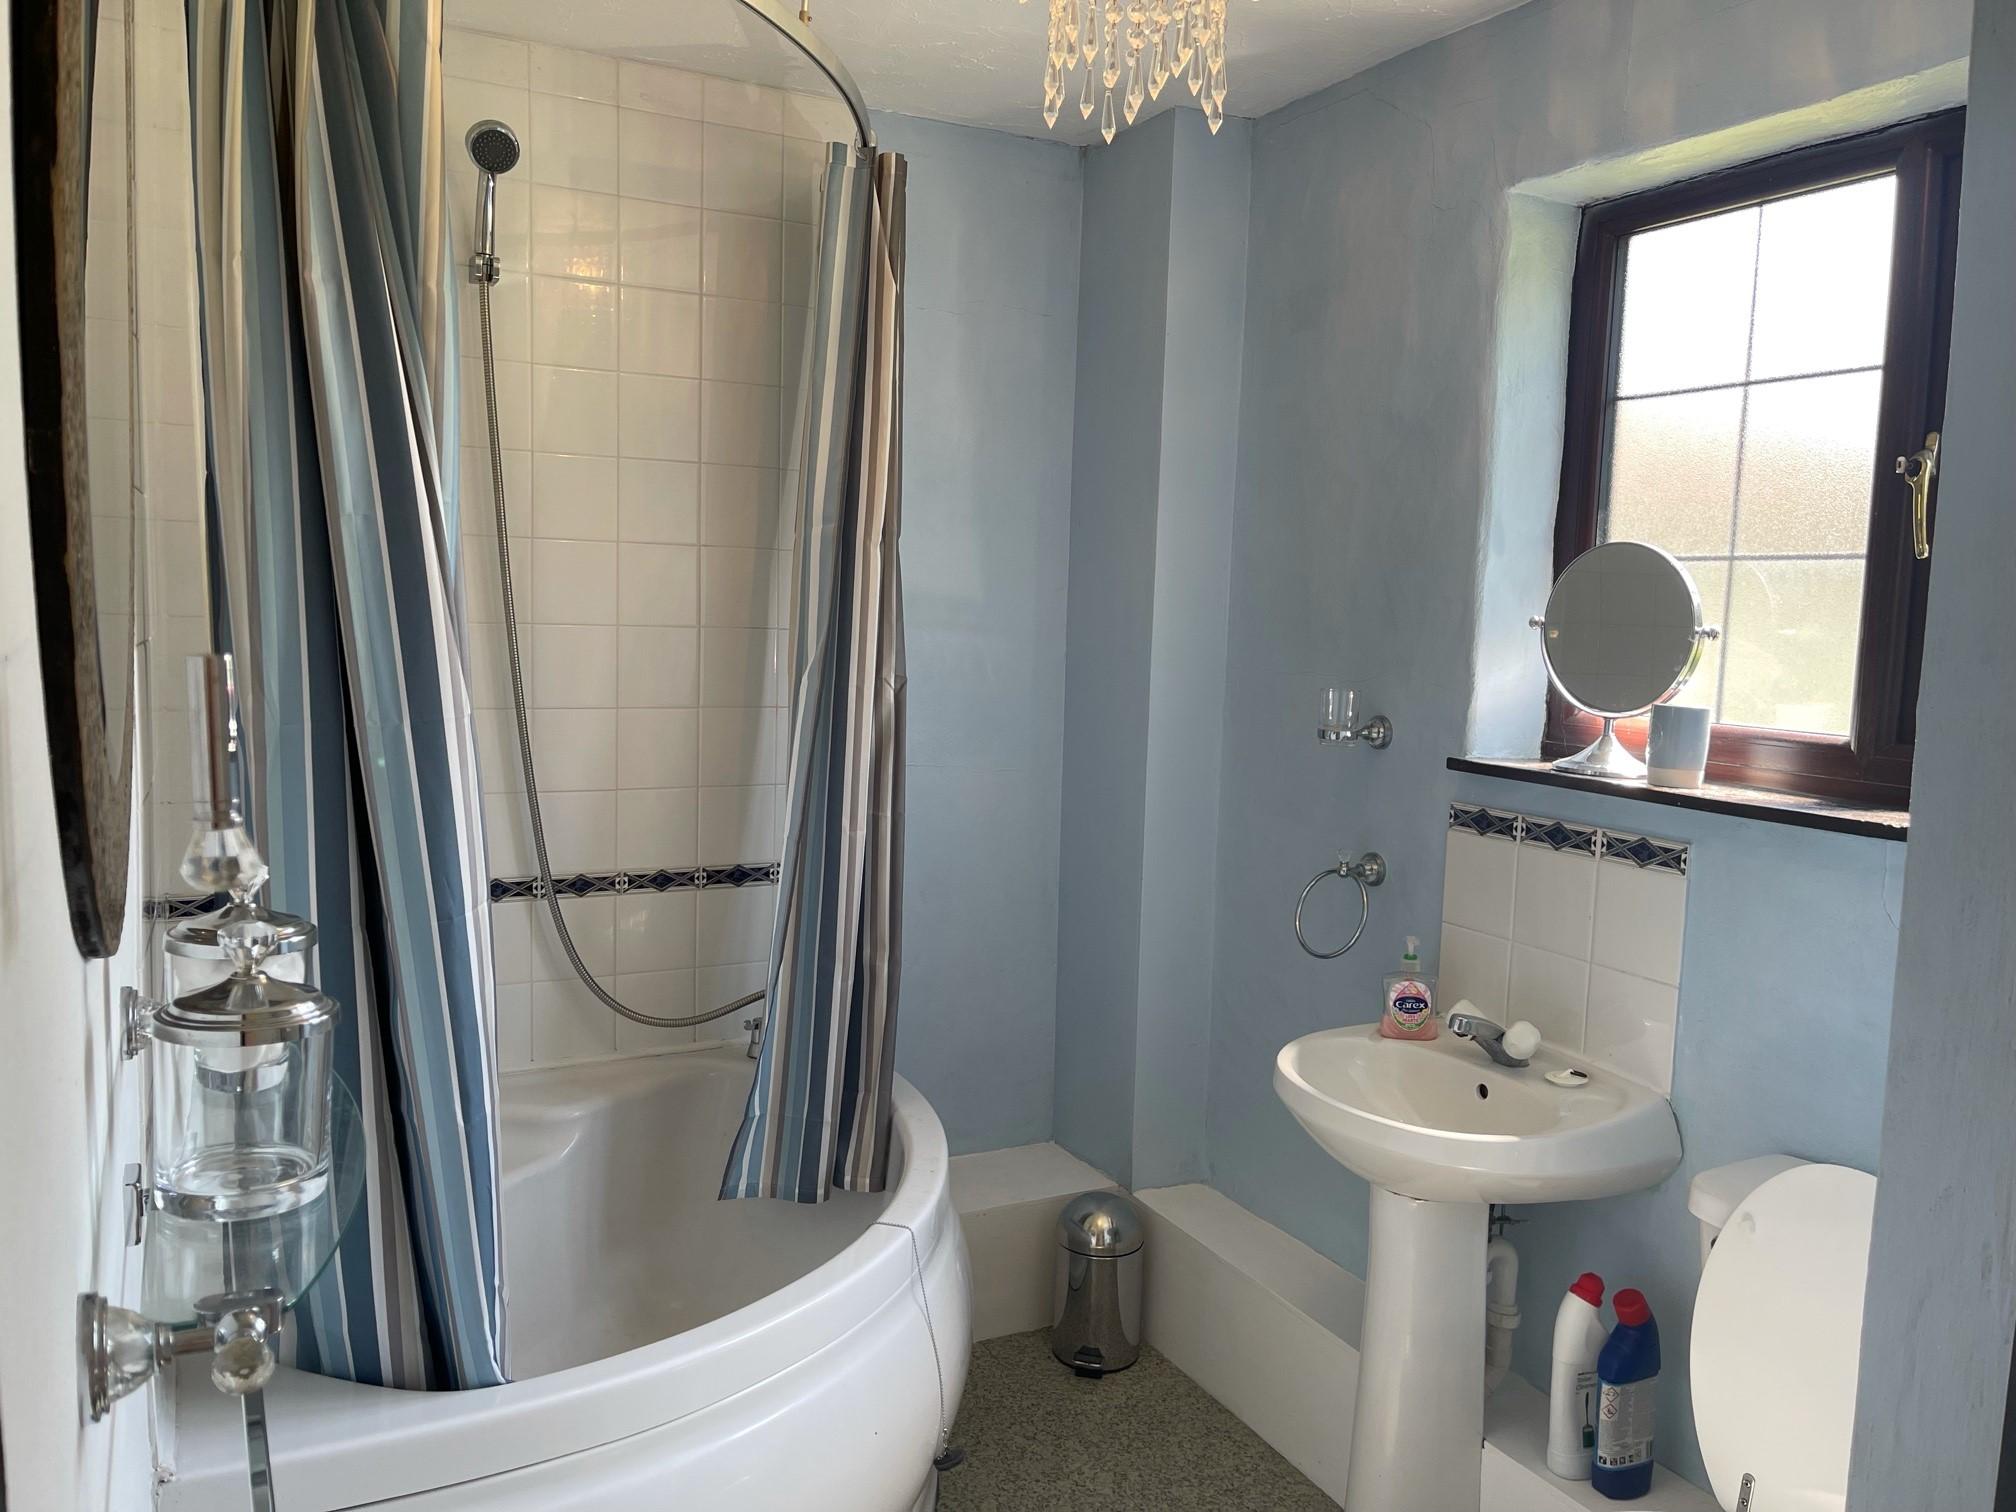 39 Will Bathroom